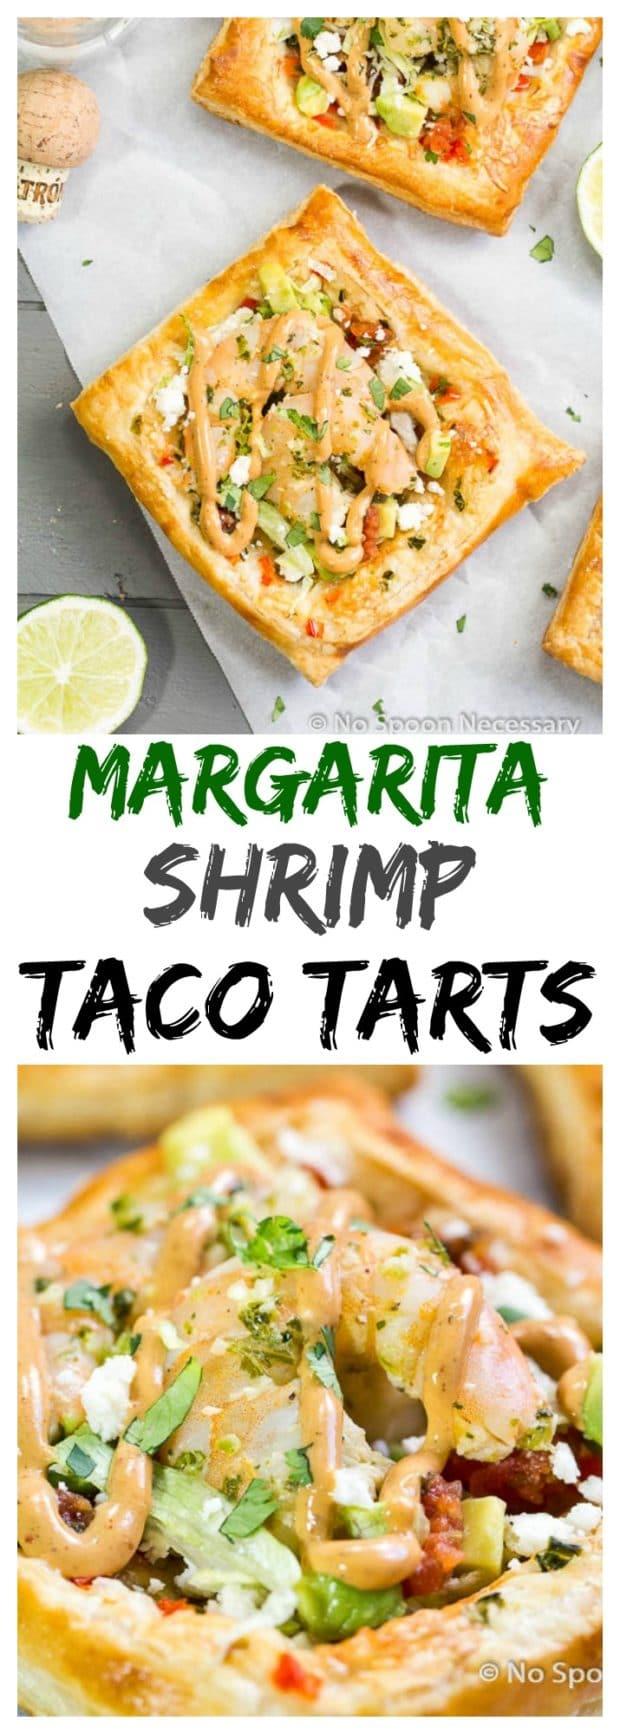 Margarita Shrimp Taco Tarts